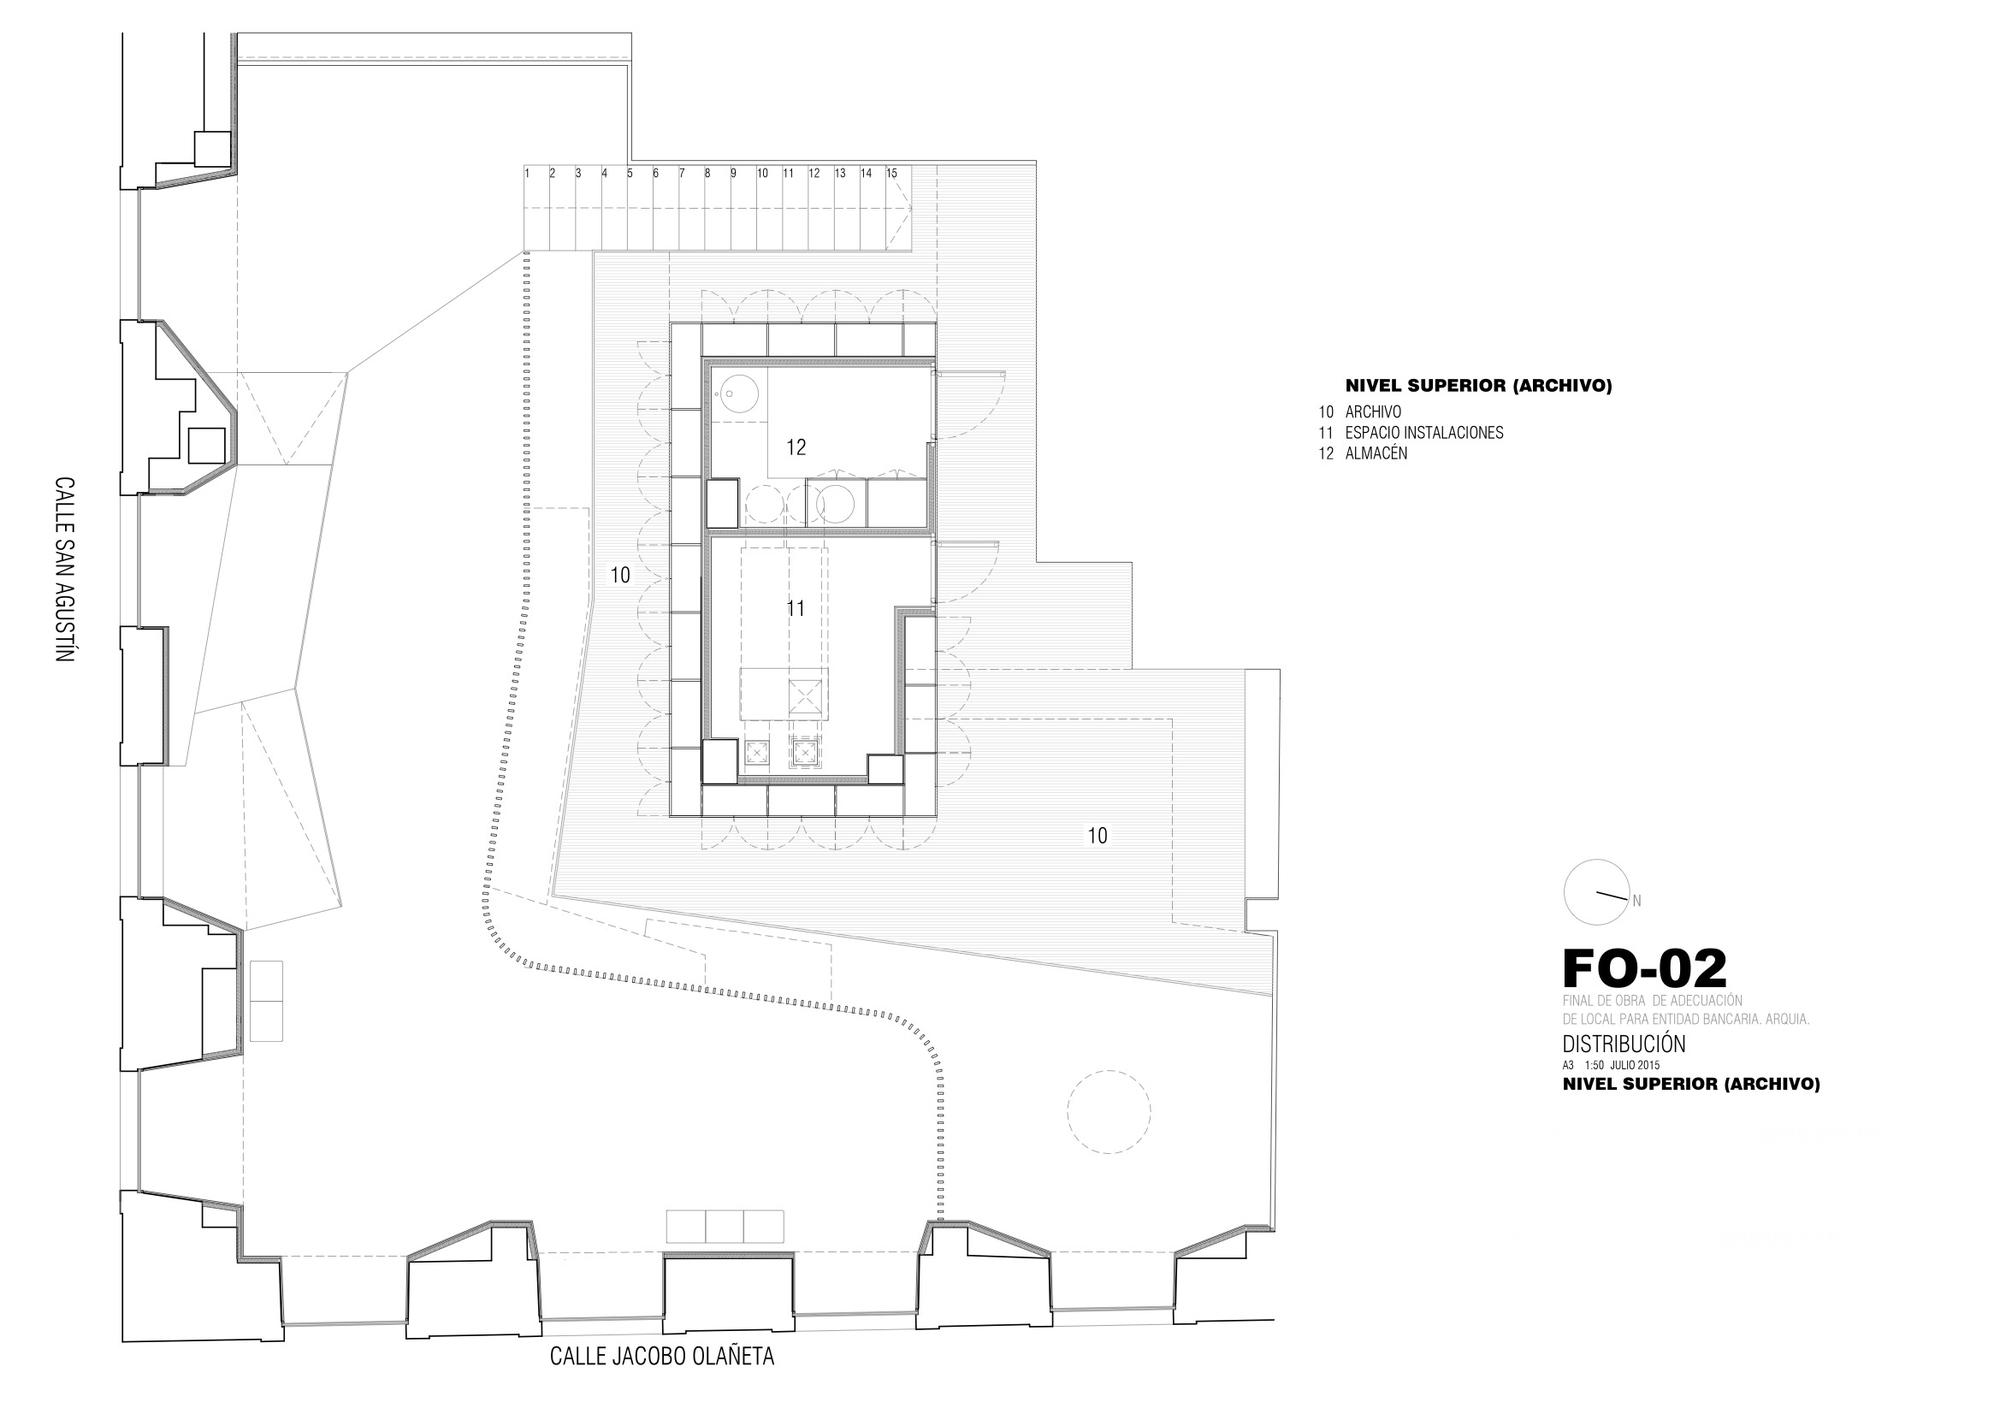 Arquitectos en bilbao beautiful dellekamp arquitectos - Arquitectos en bilbao ...